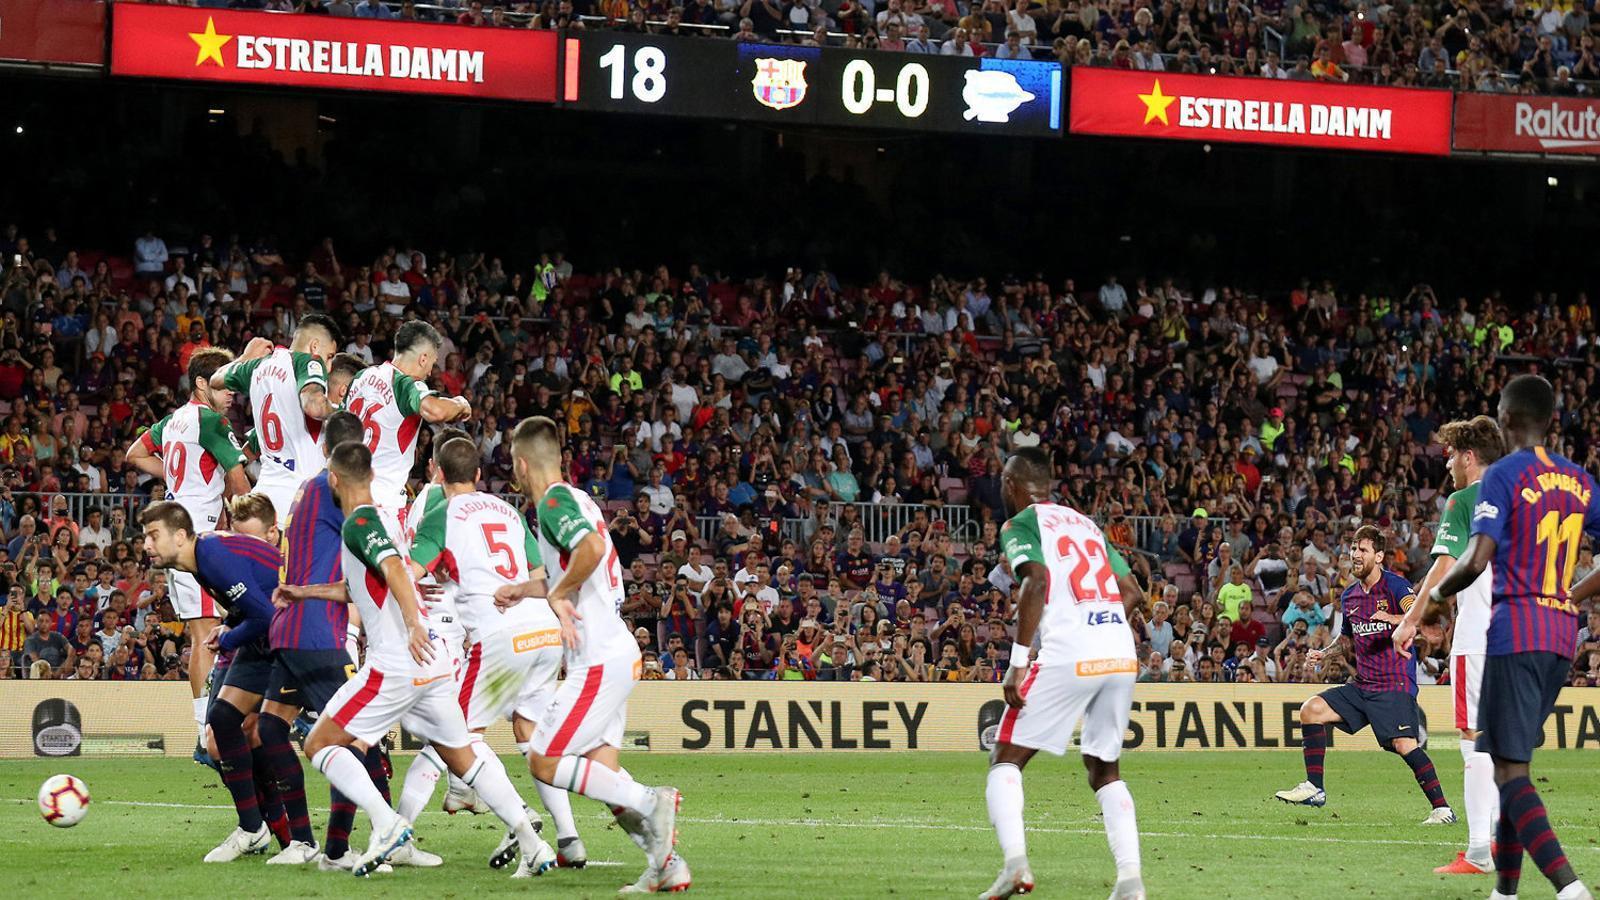 Un equip en mans  De Lionel Messi